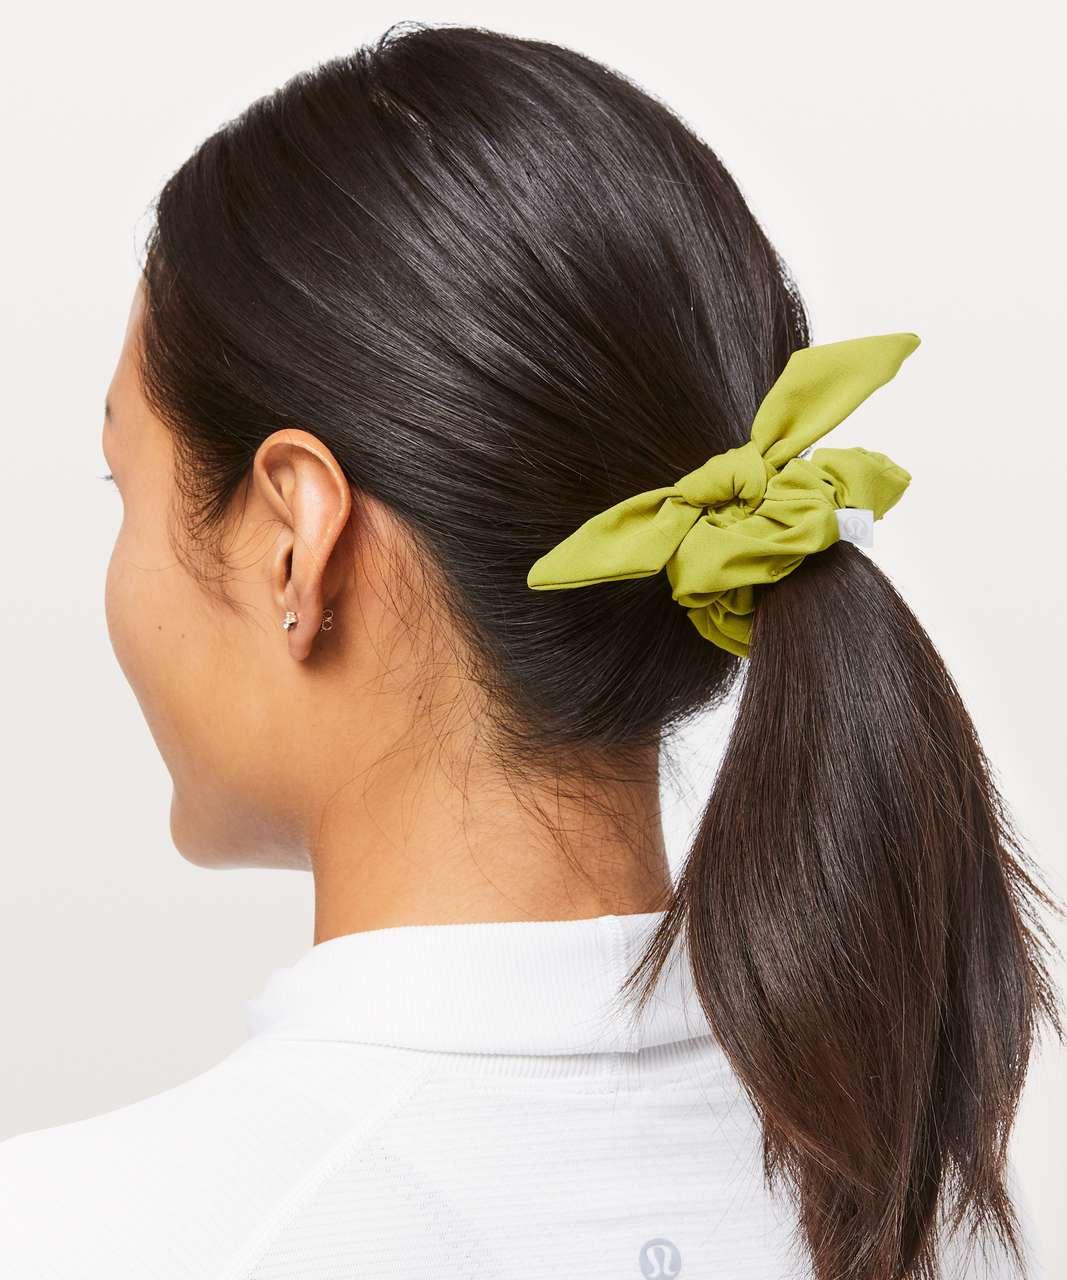 Lululemon Uplifting Scrunchie *Bow - Golden Lime